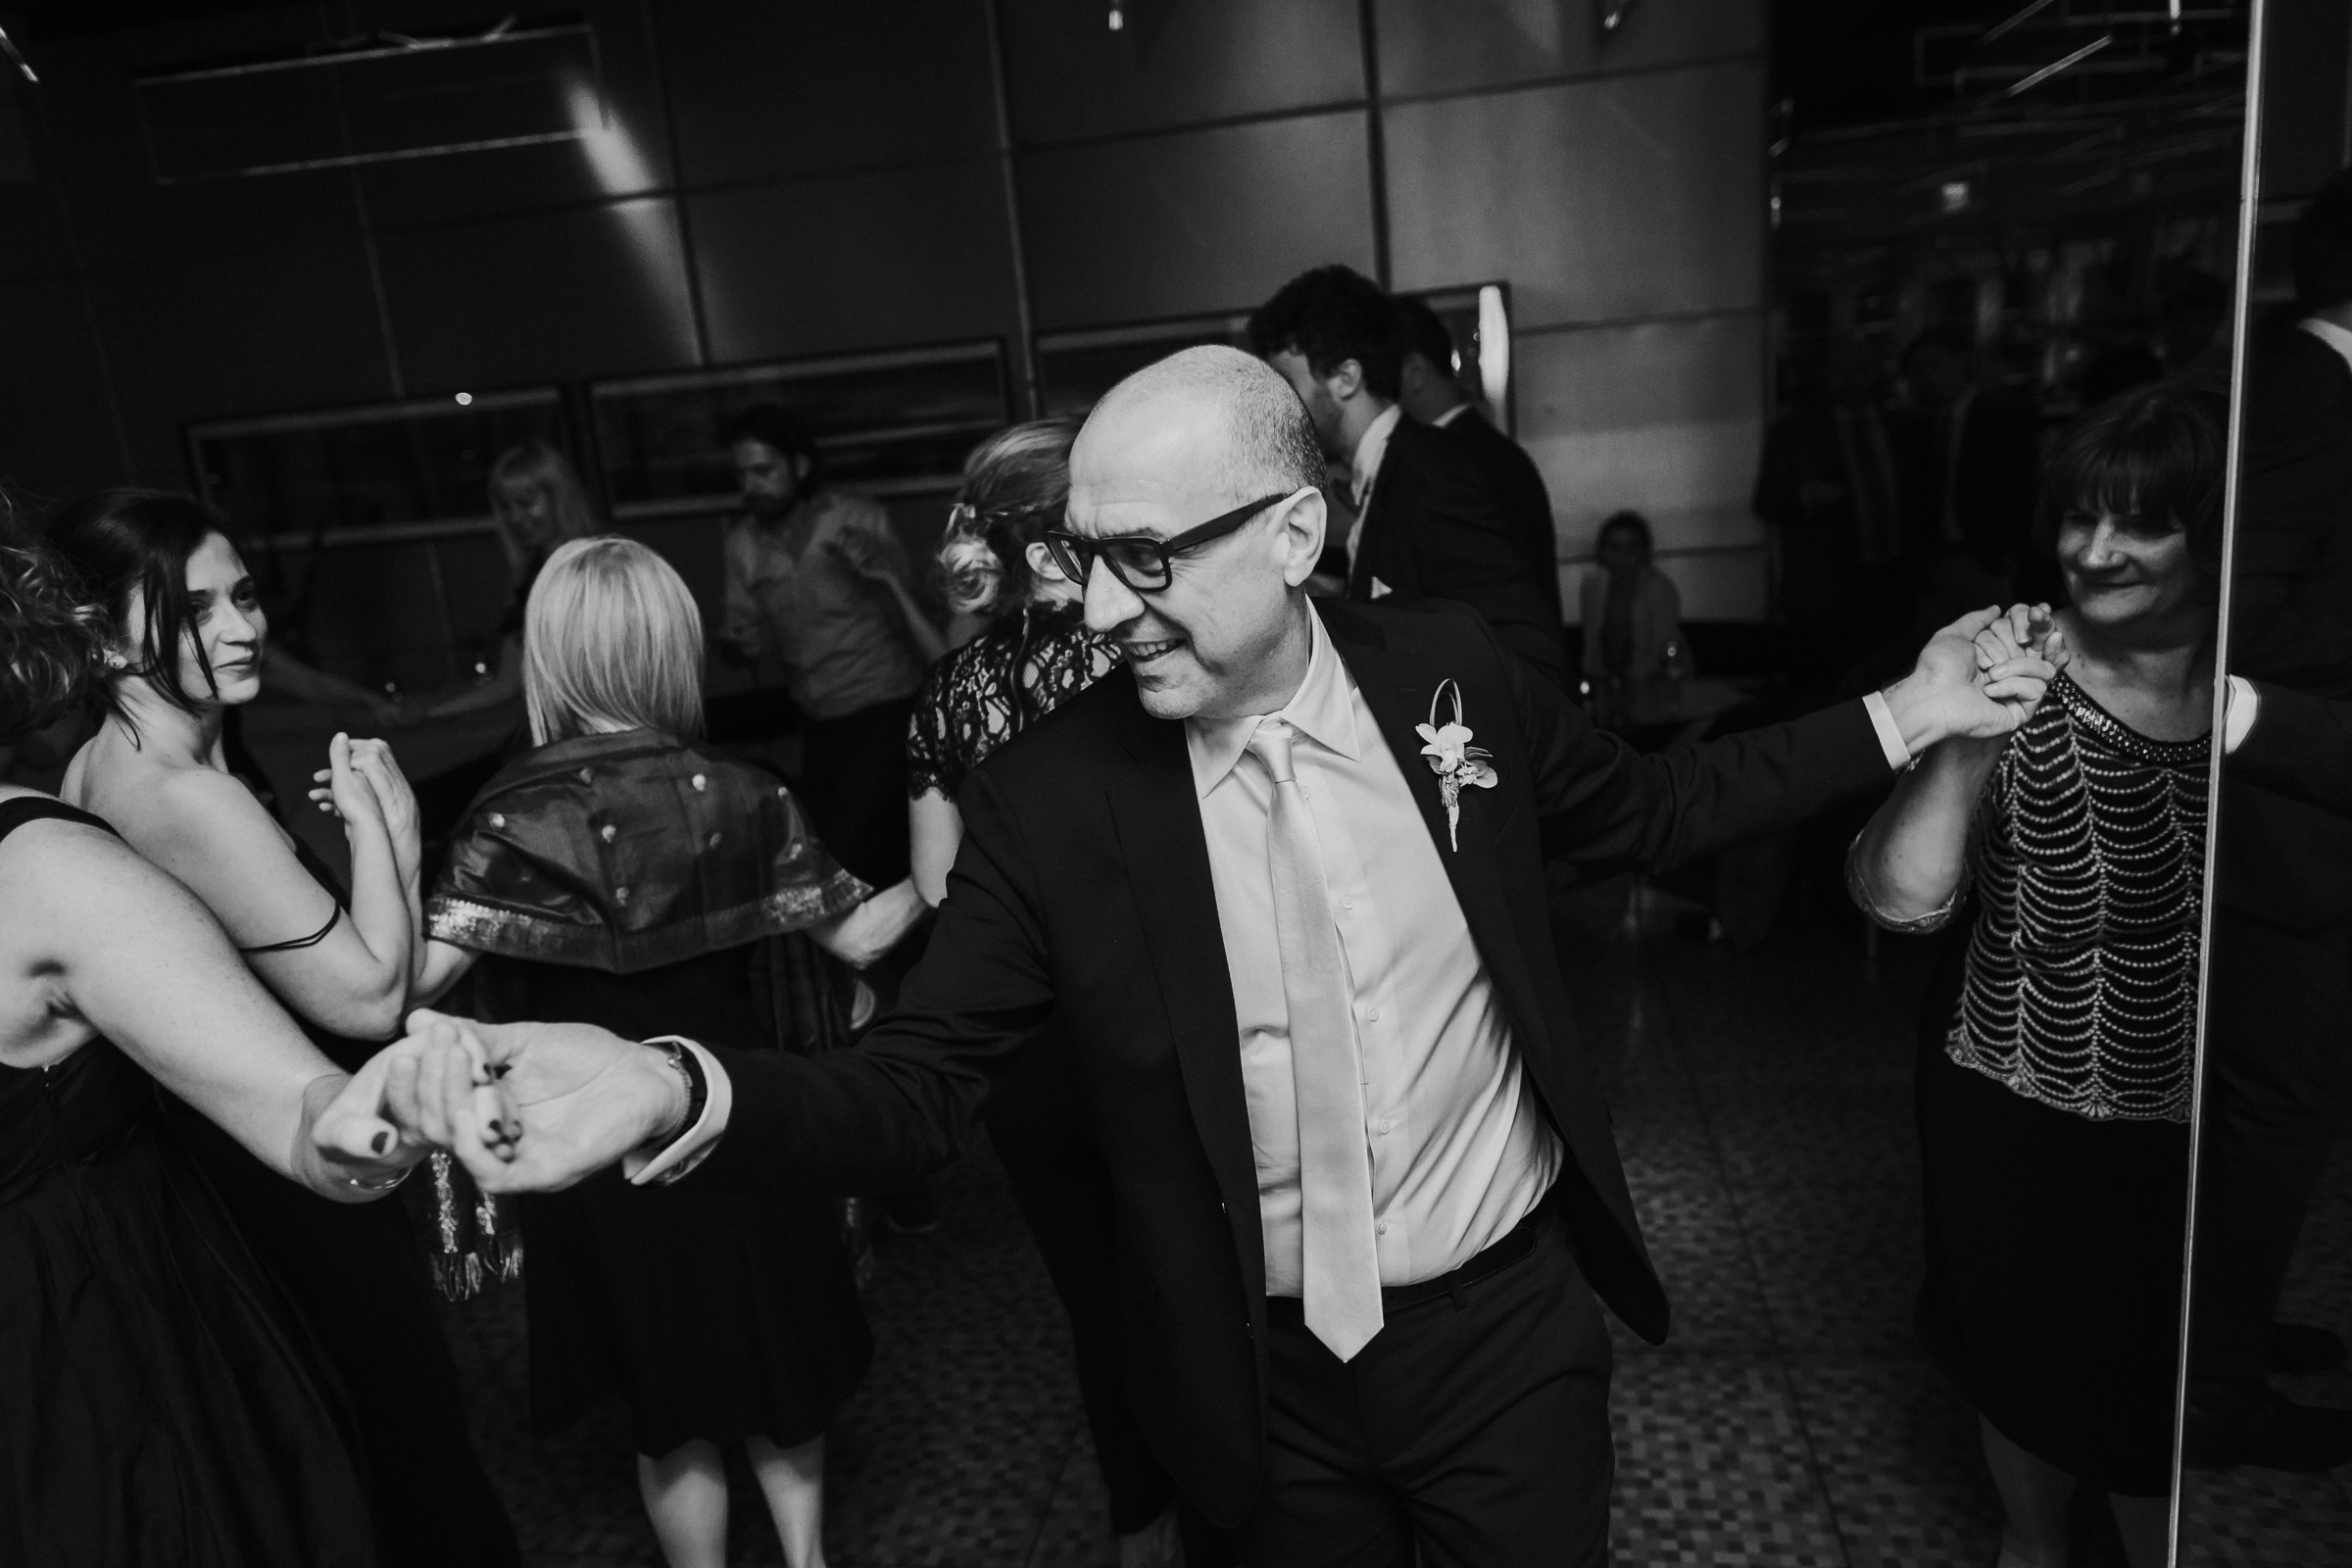 Robert-NYC-Museum-Of-Arts-&-Design-Greek-Italian-New-York-Documentary-Wedding-Photographer-72.jpg